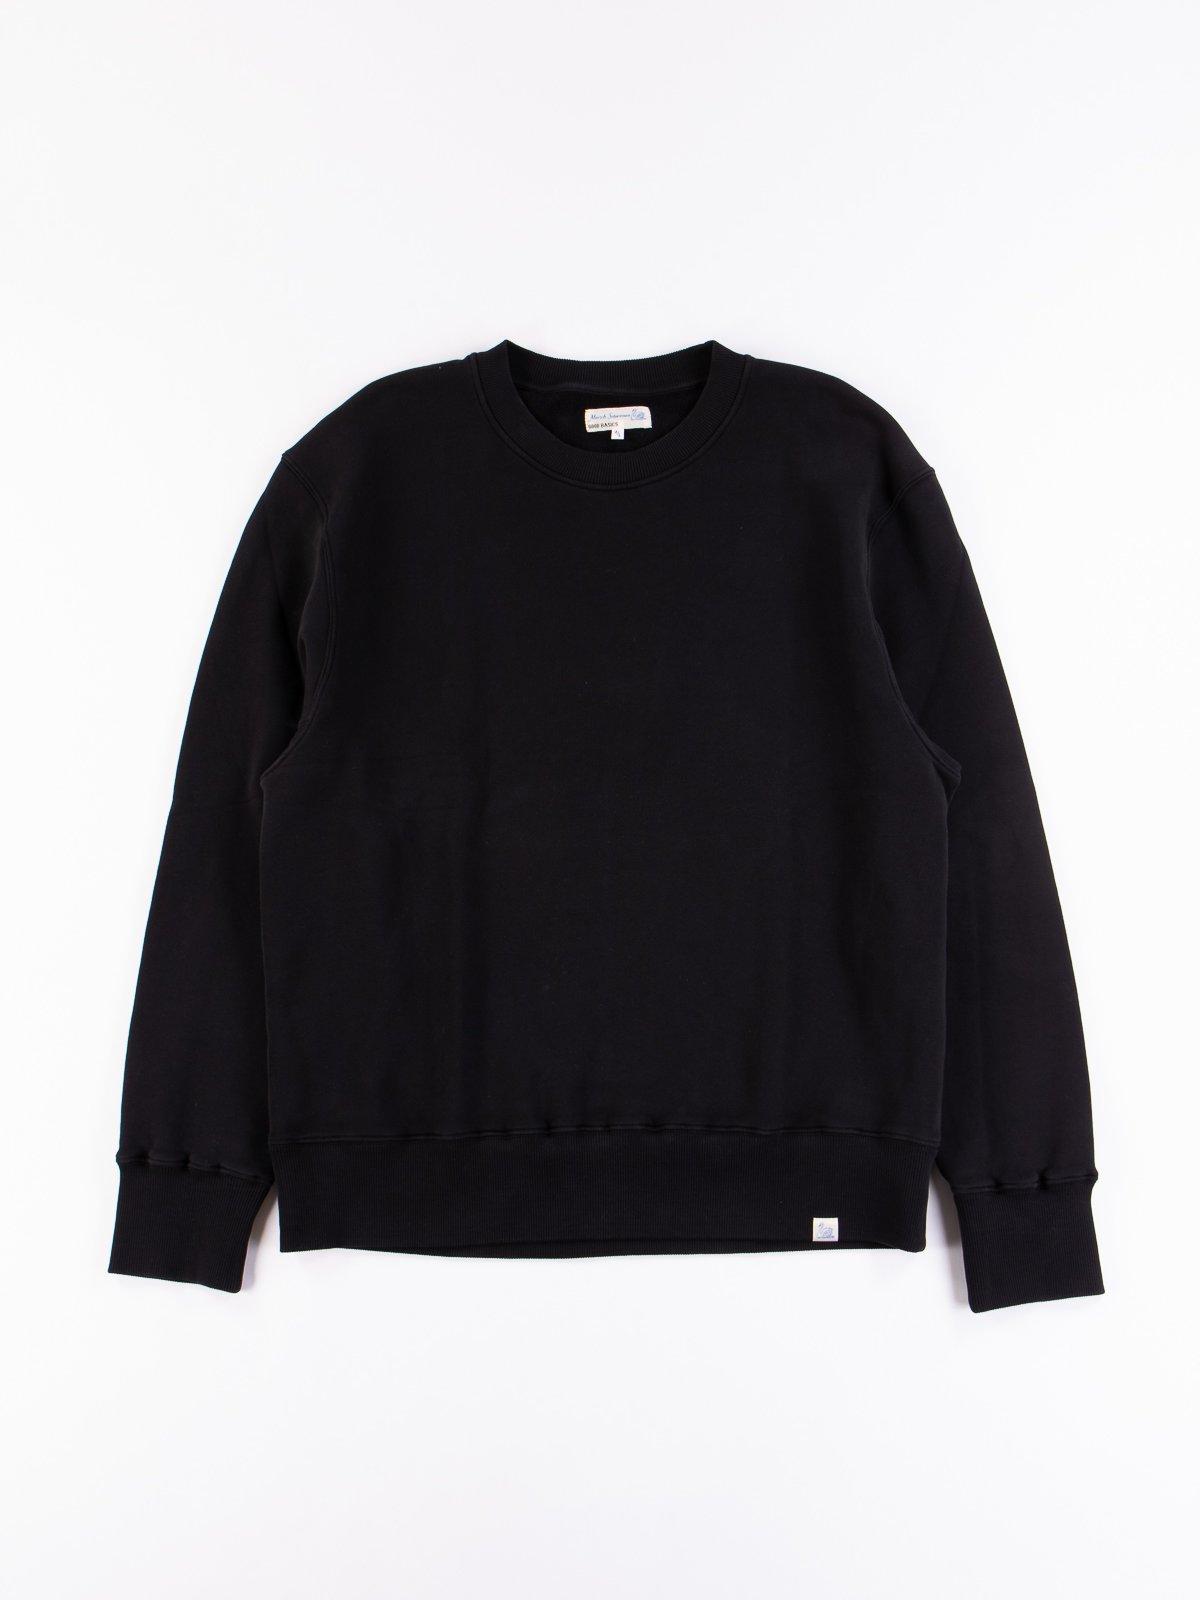 Deep Black Good Basics CSWOS01 Oversized Crew Neck Sweater - Image 1